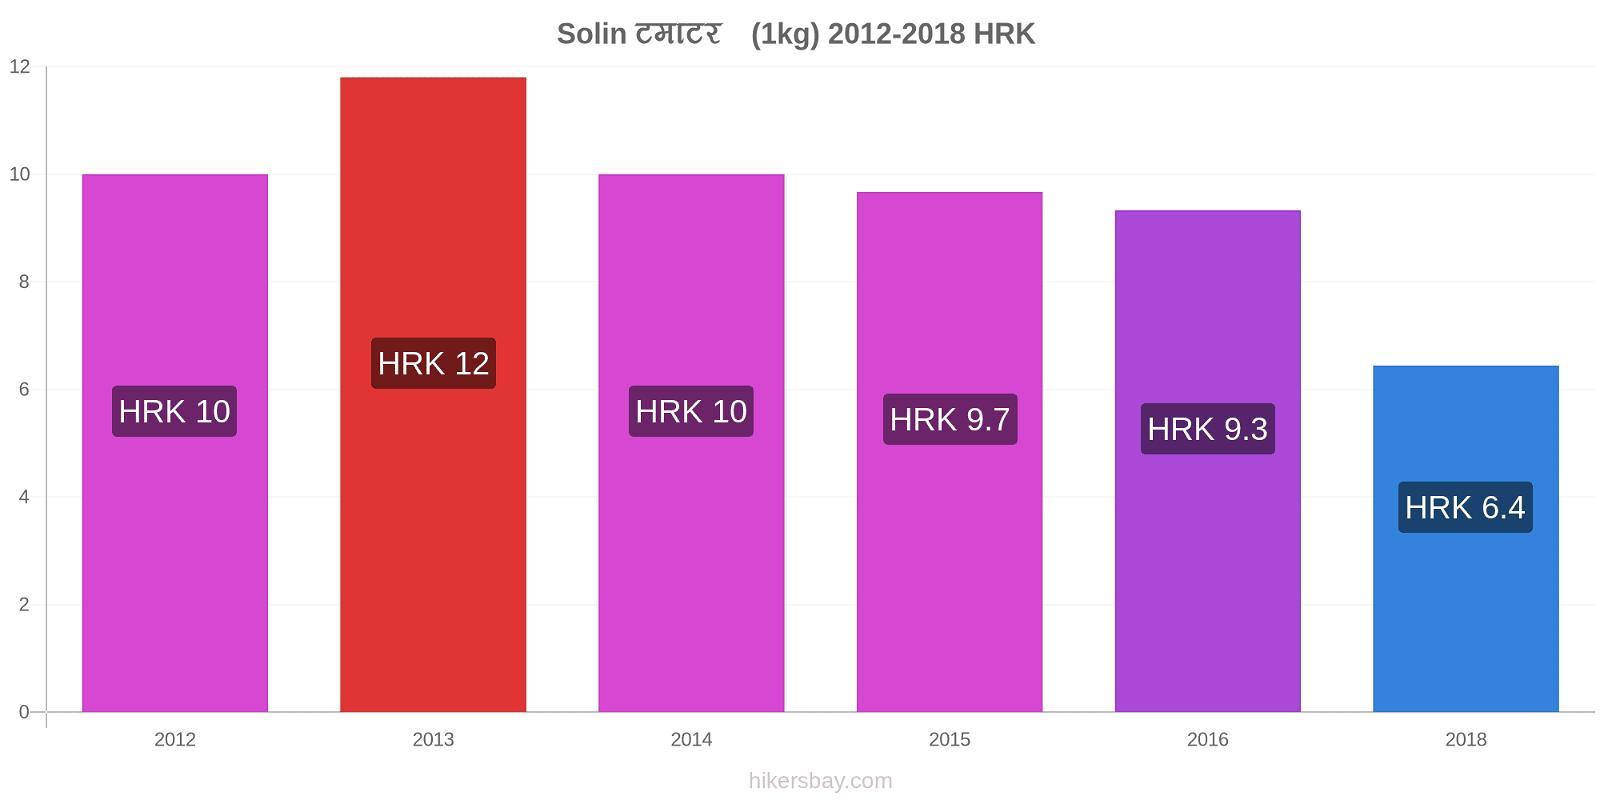 Solin मूल्य परिवर्तन टमाटर (1kg) hikersbay.com